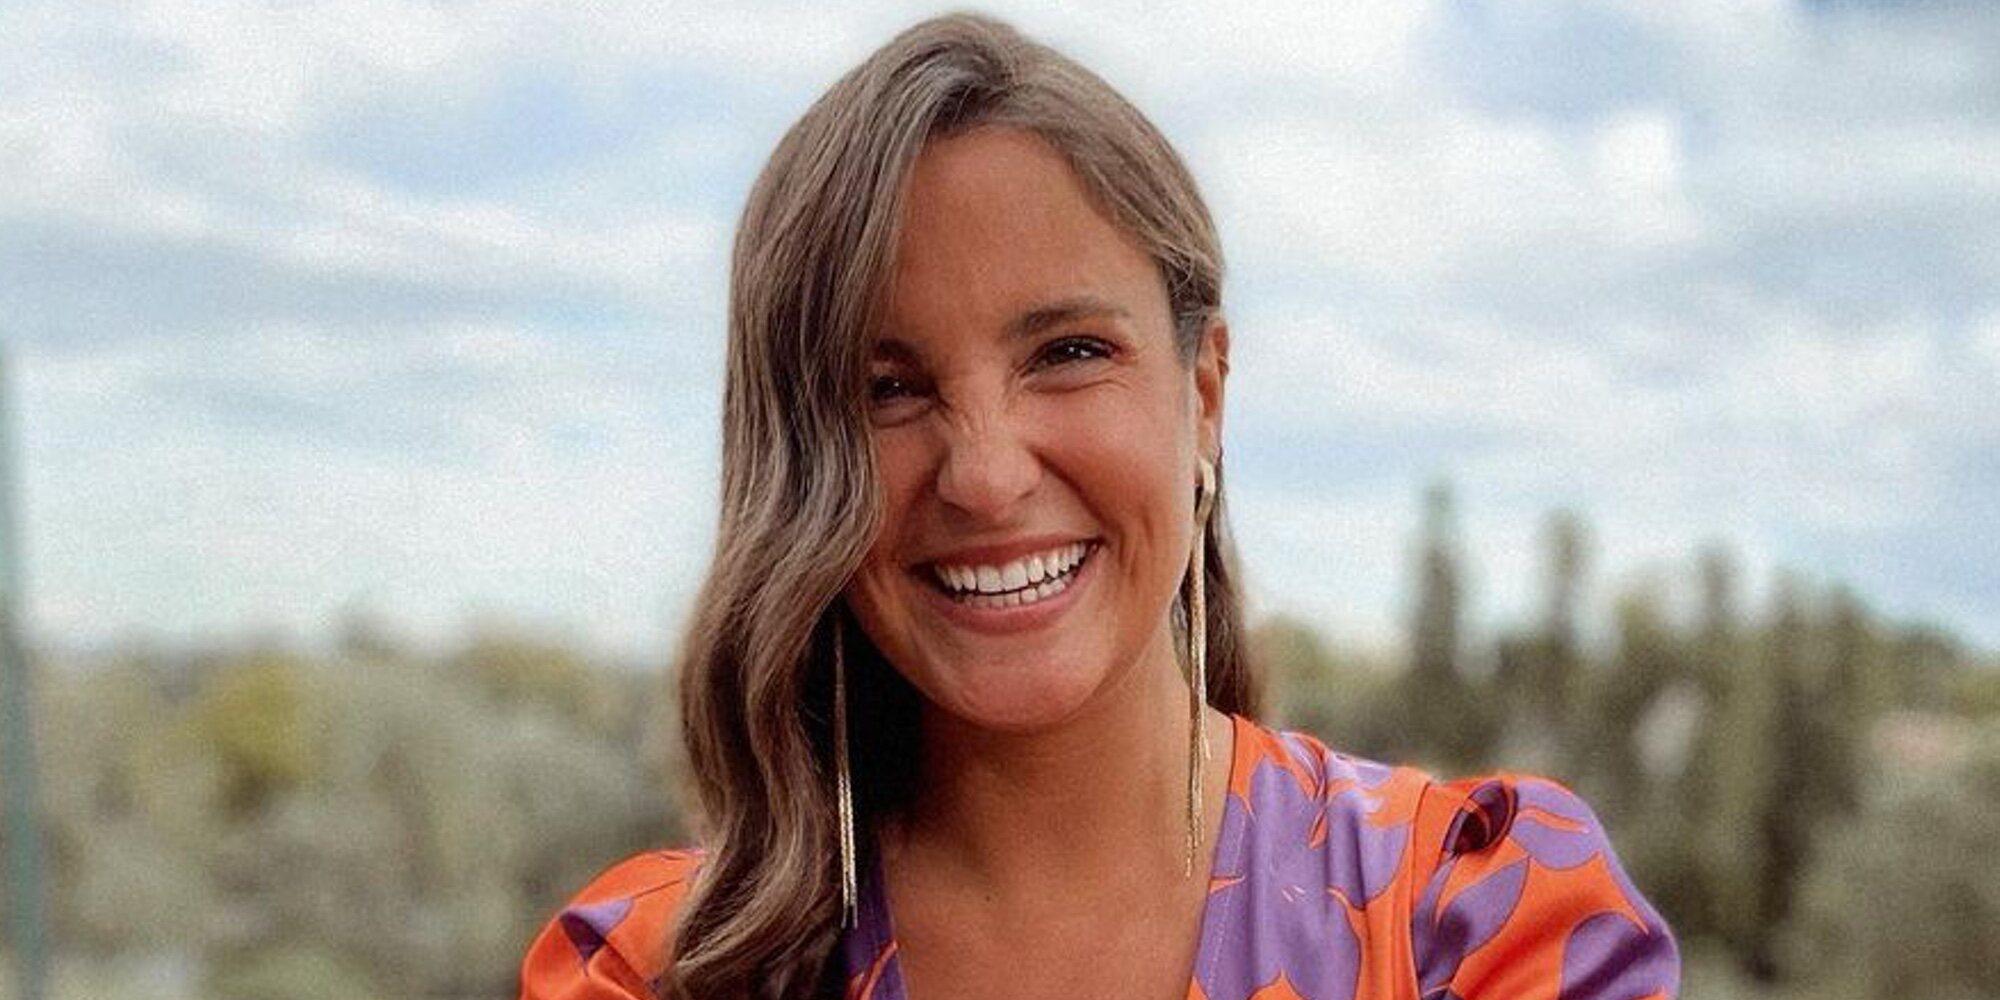 Marta Pombo comparte lo feliz que es con Luis Zamalloa